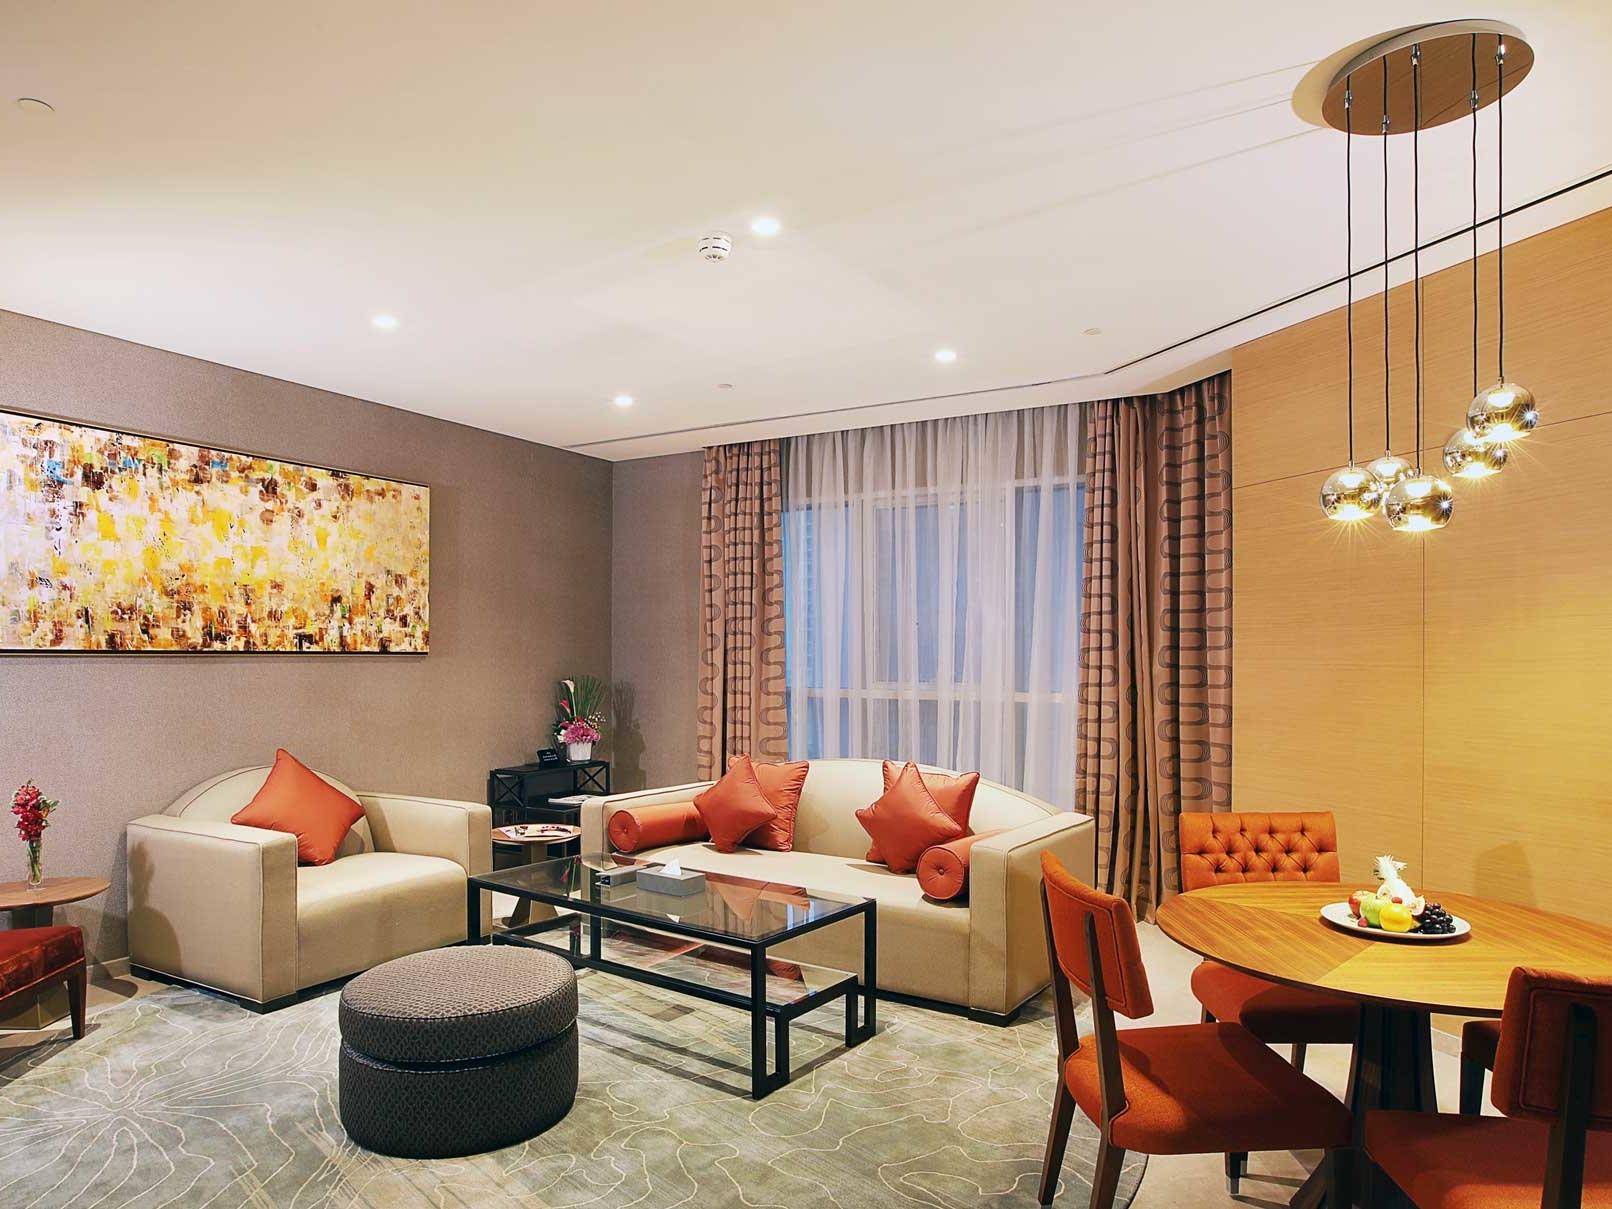 Grand Suite at Grand Cosmopolitan Hotel in Dubai